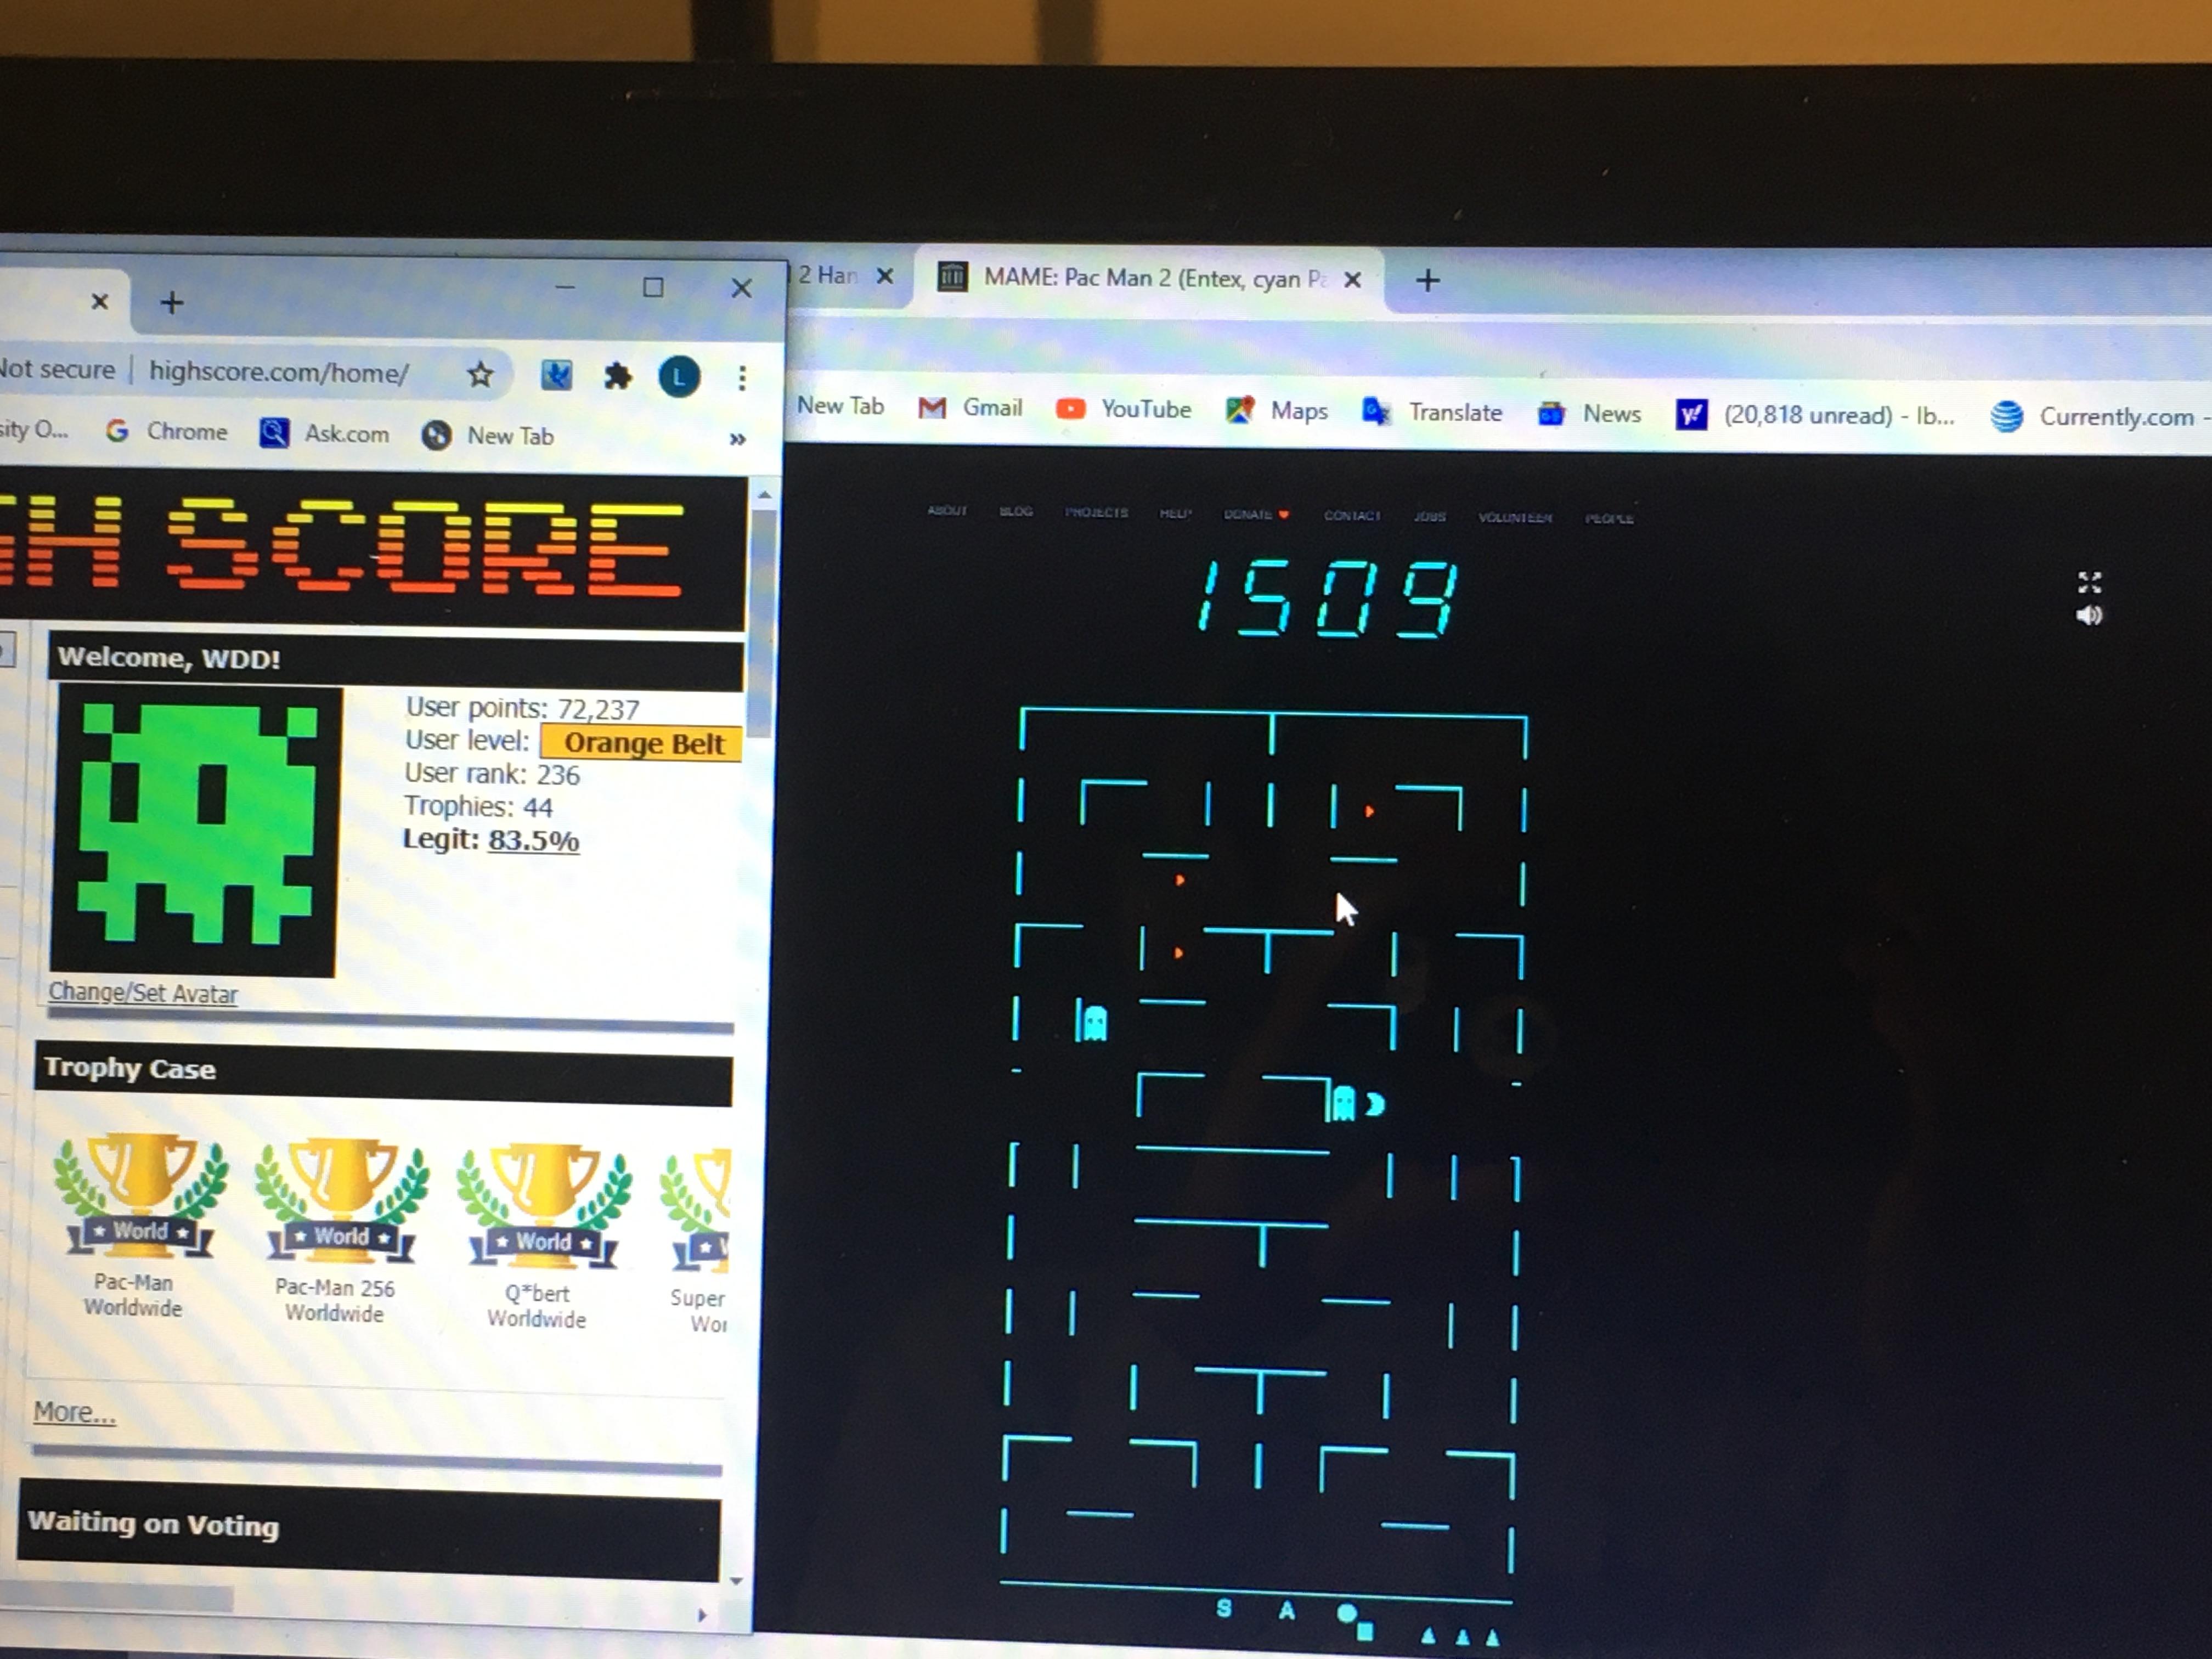 Entex Pac-Man 2 [Skill 2] 1,509 points